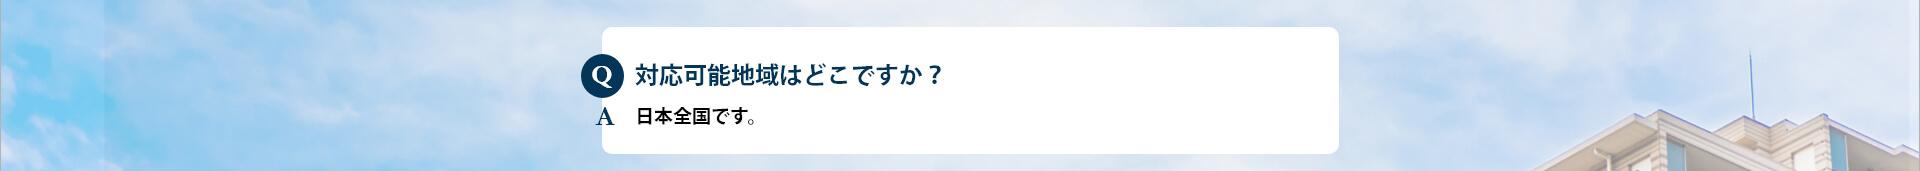 Q 対応可能地域はどこですか?A 日本全国です